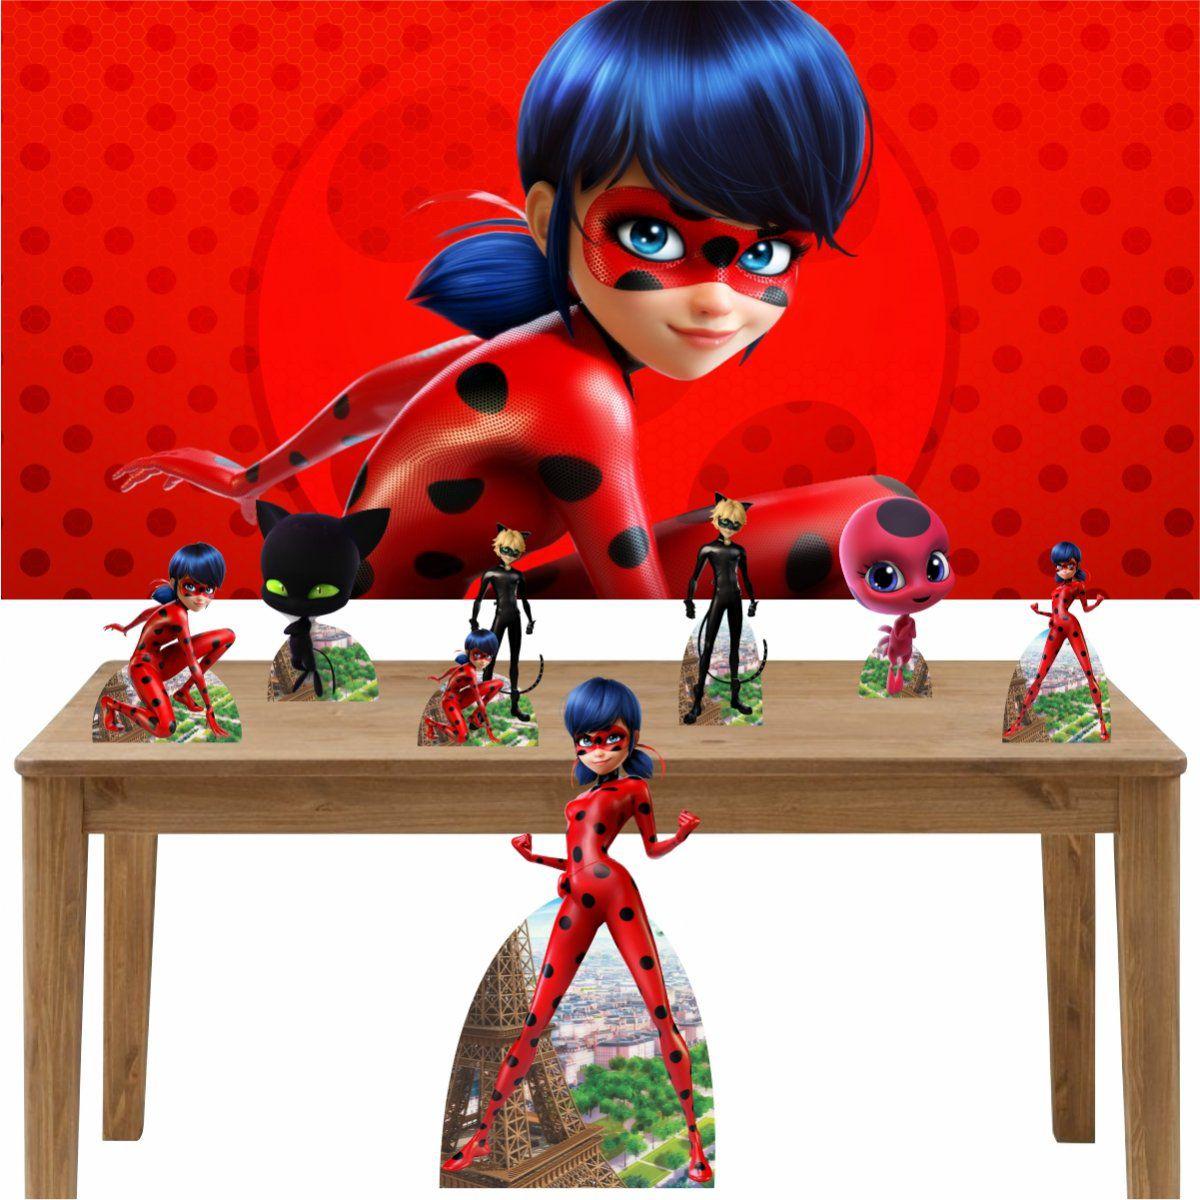 Kit Decoração de Festa Totem Display 8 Peças Ladybug